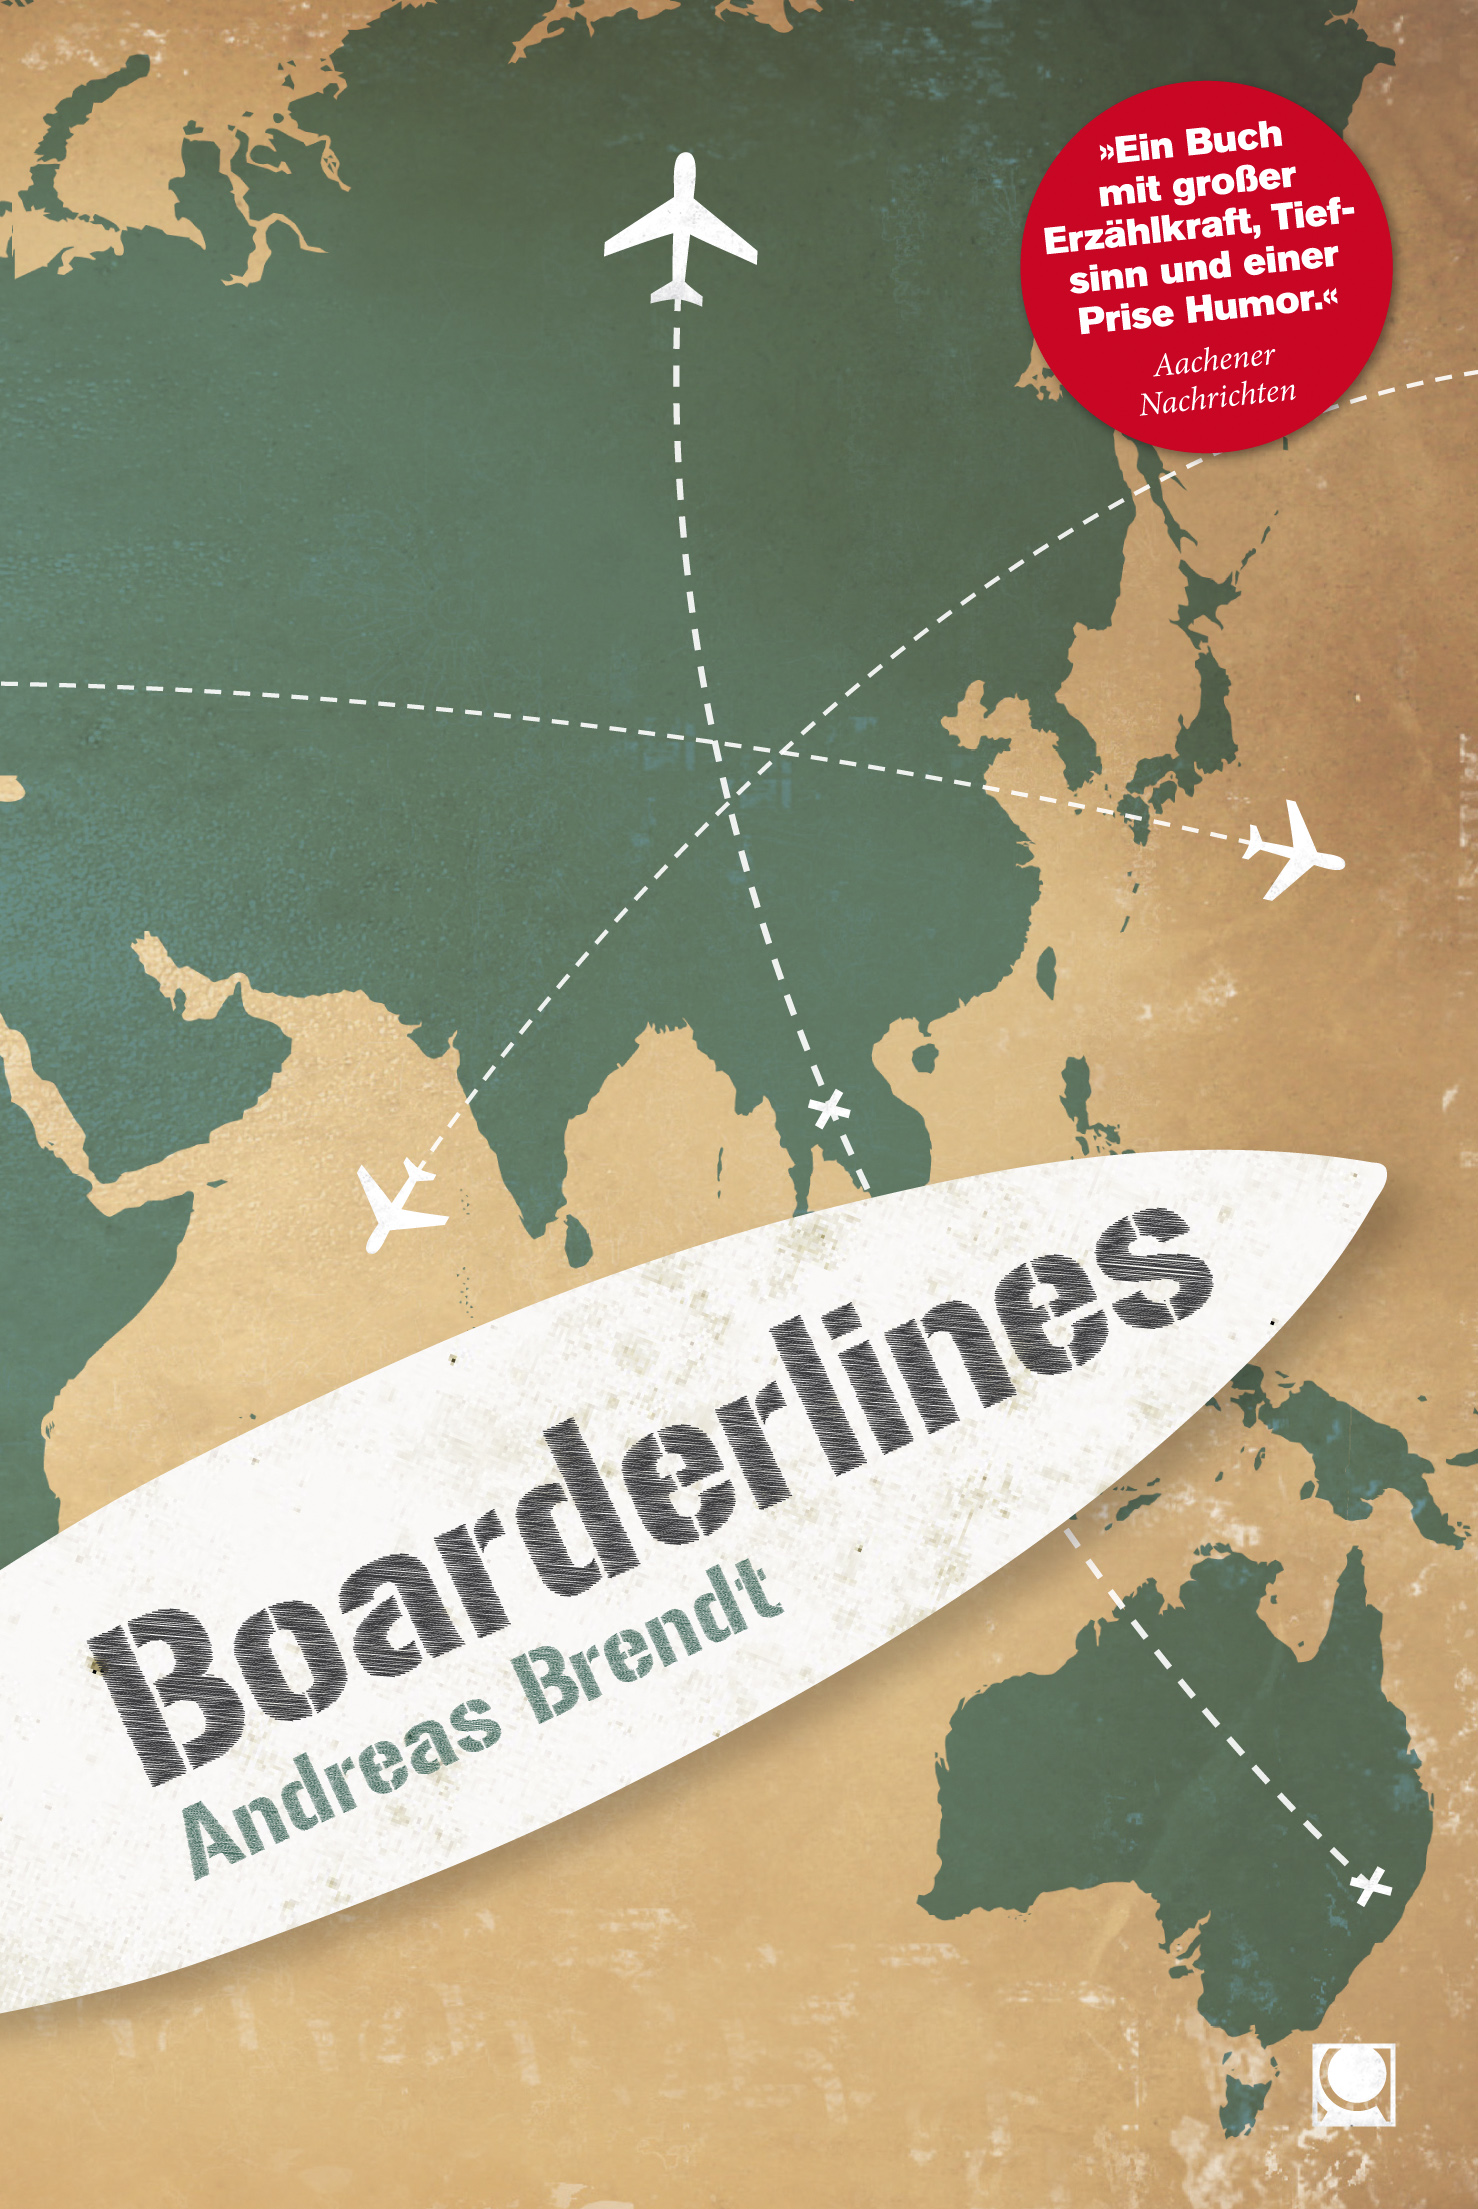 Geheimtipp – Boarderlines